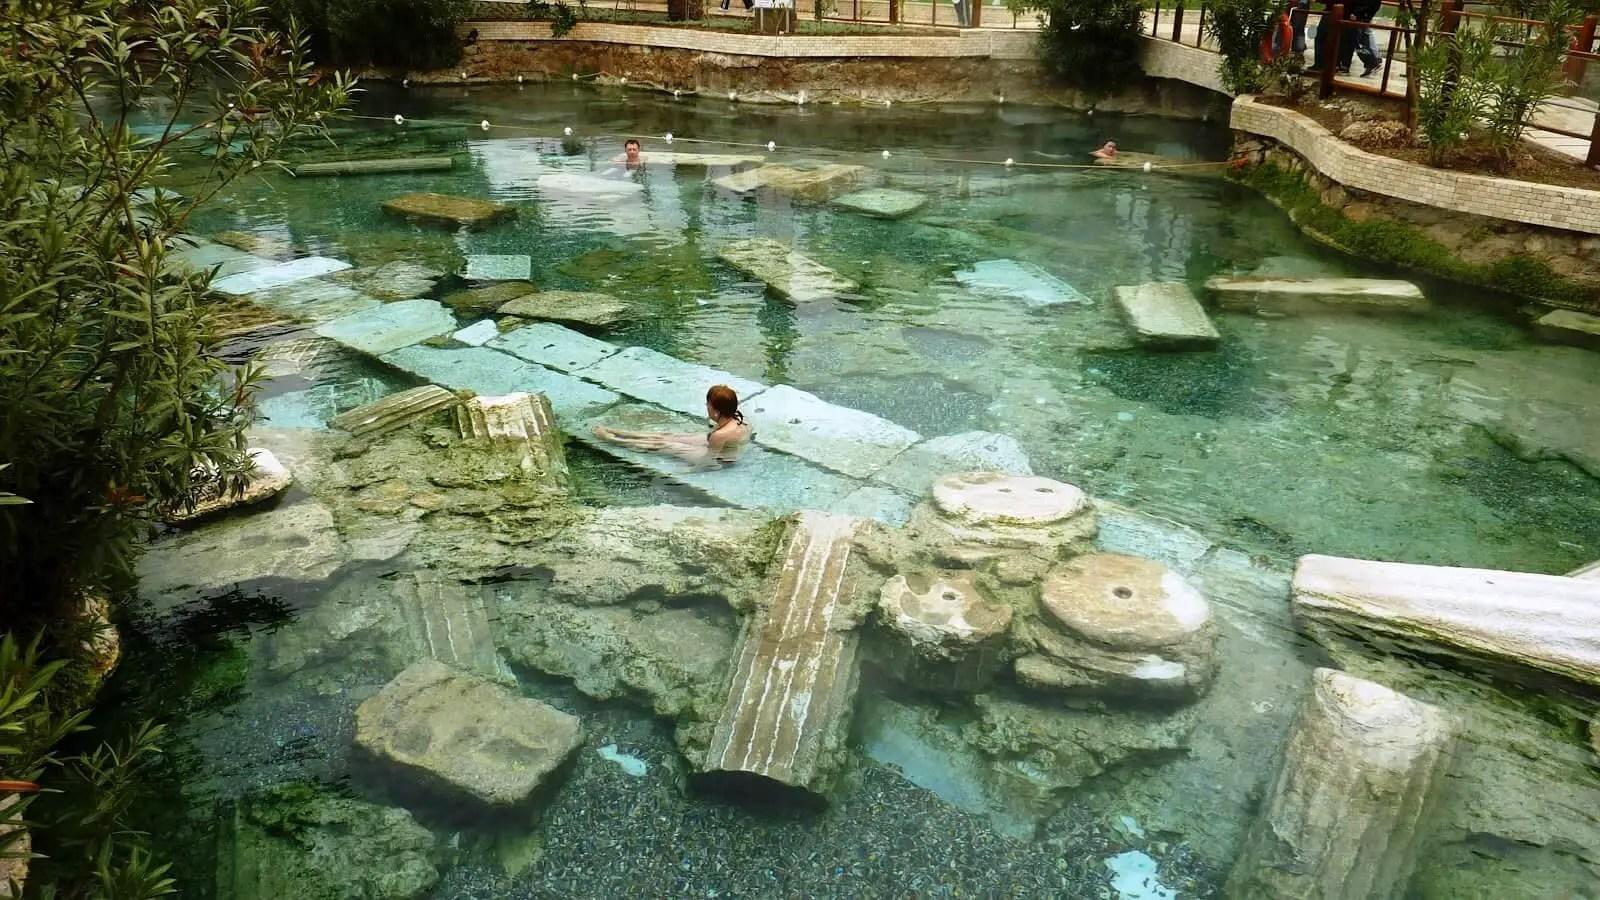 cleopatra's pools